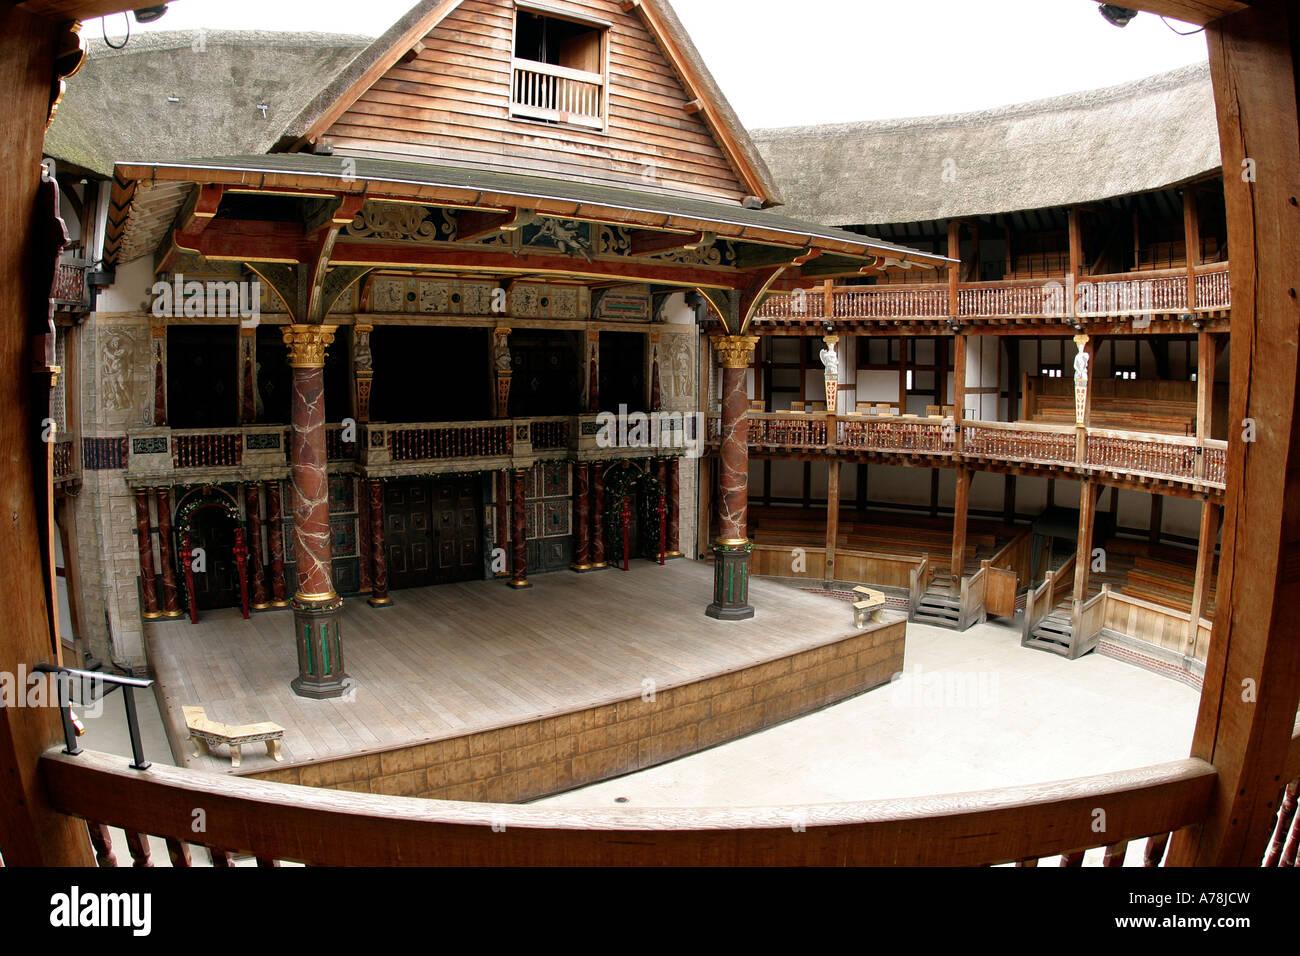 UK London Bankside Shakespeares Globe Theatre stage and auditorium - Stock Image